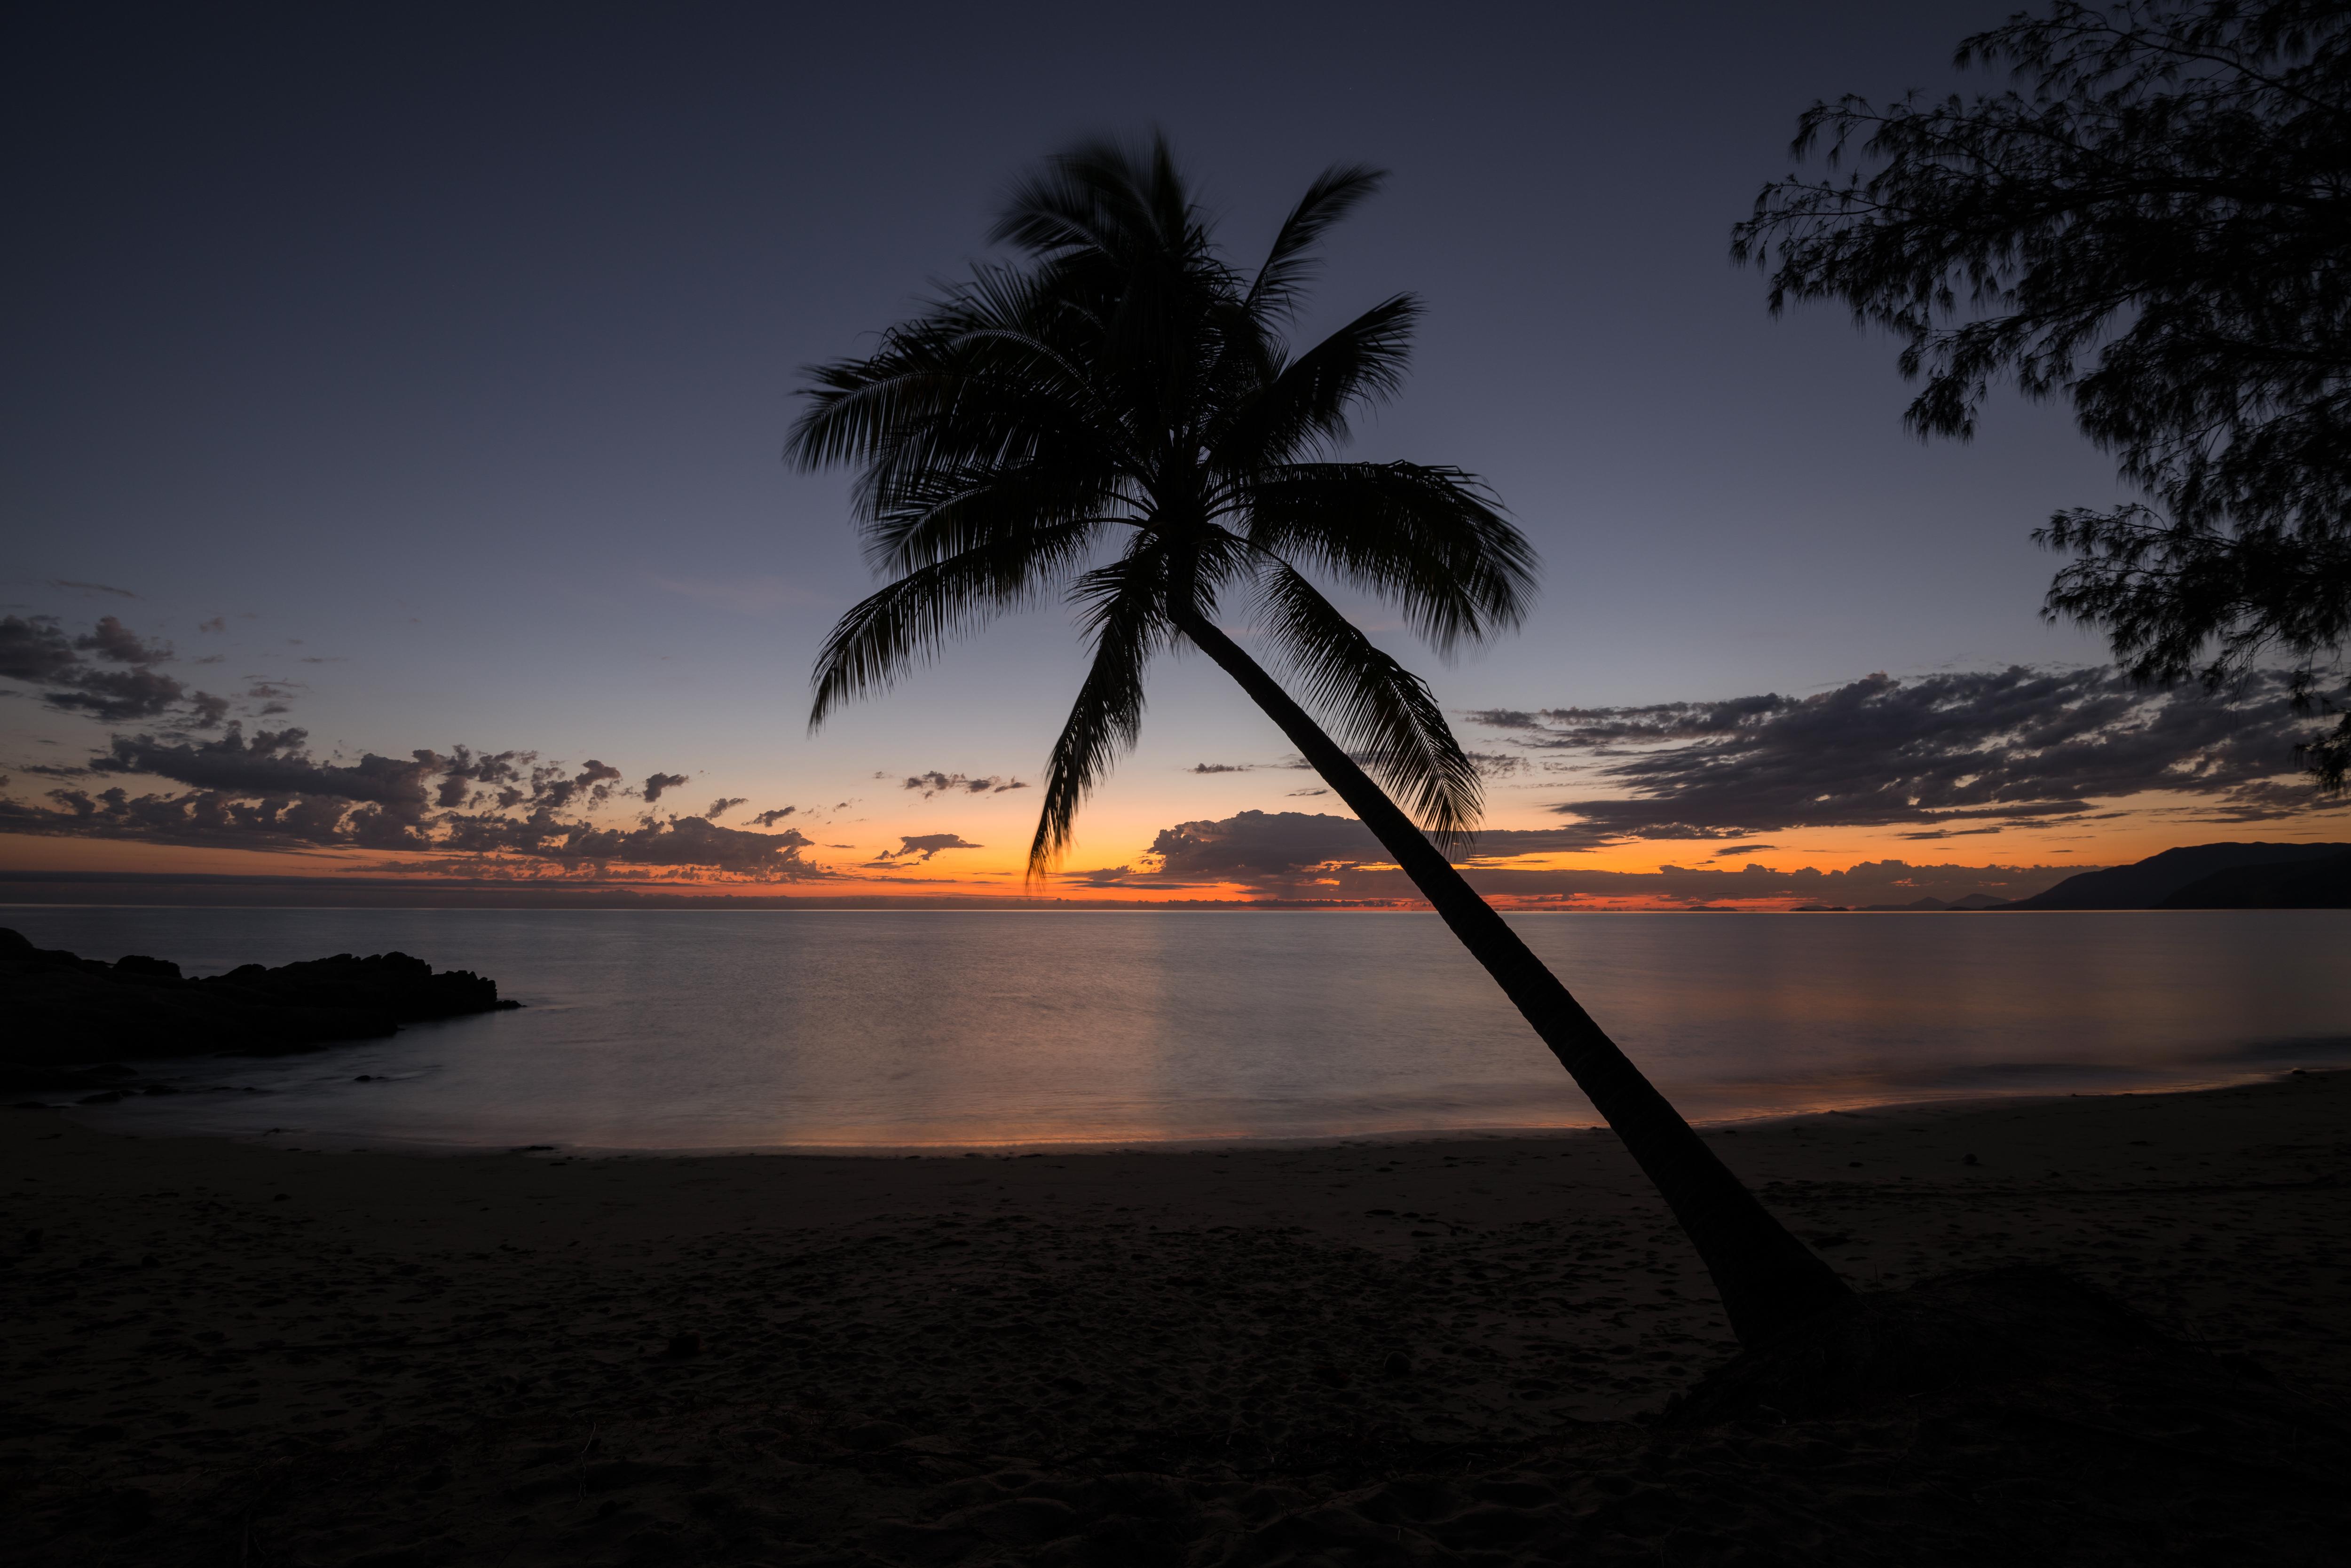 https://www.thalabeach.com.au/wp-content/uploads/2010/07/Thala_Beach_Nature_Reserve_2016__49.jpg